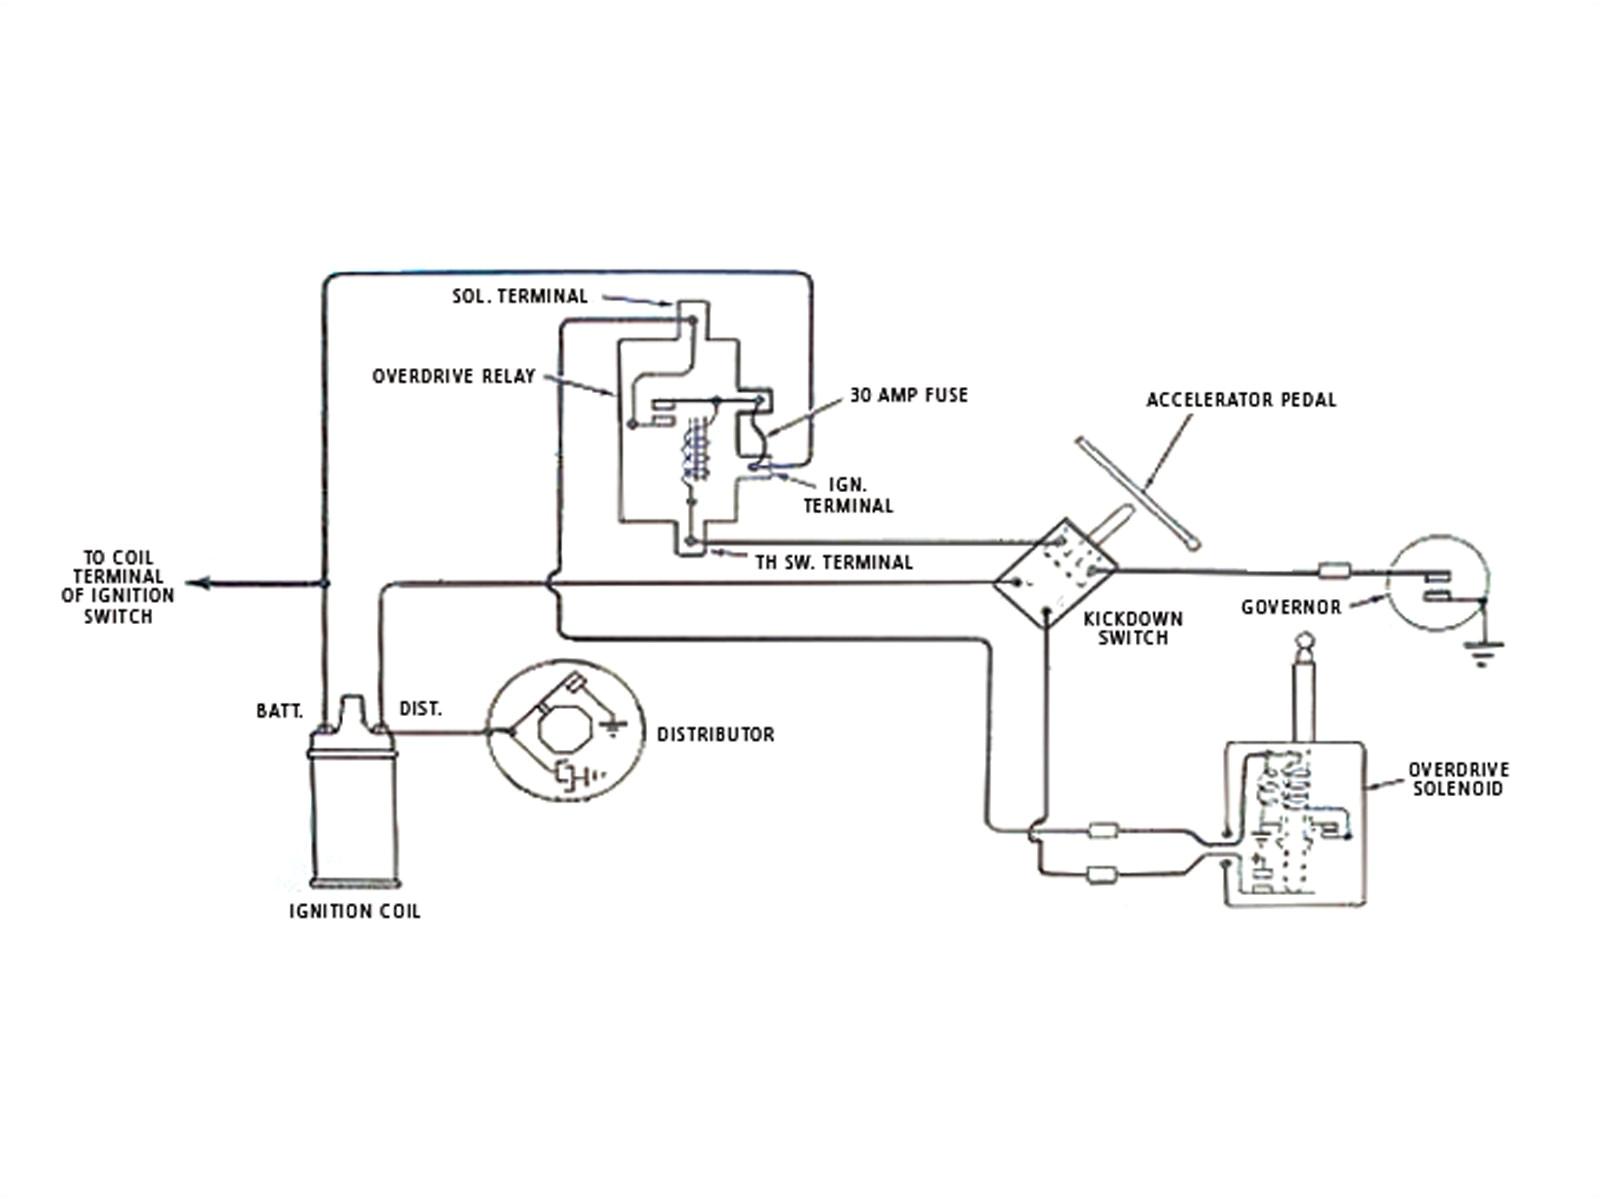 msd distributor wiring diagram new chevy ignition coil wiring diagram unique msd coil wiring diagram images of msd distributor wiring diagram jpg